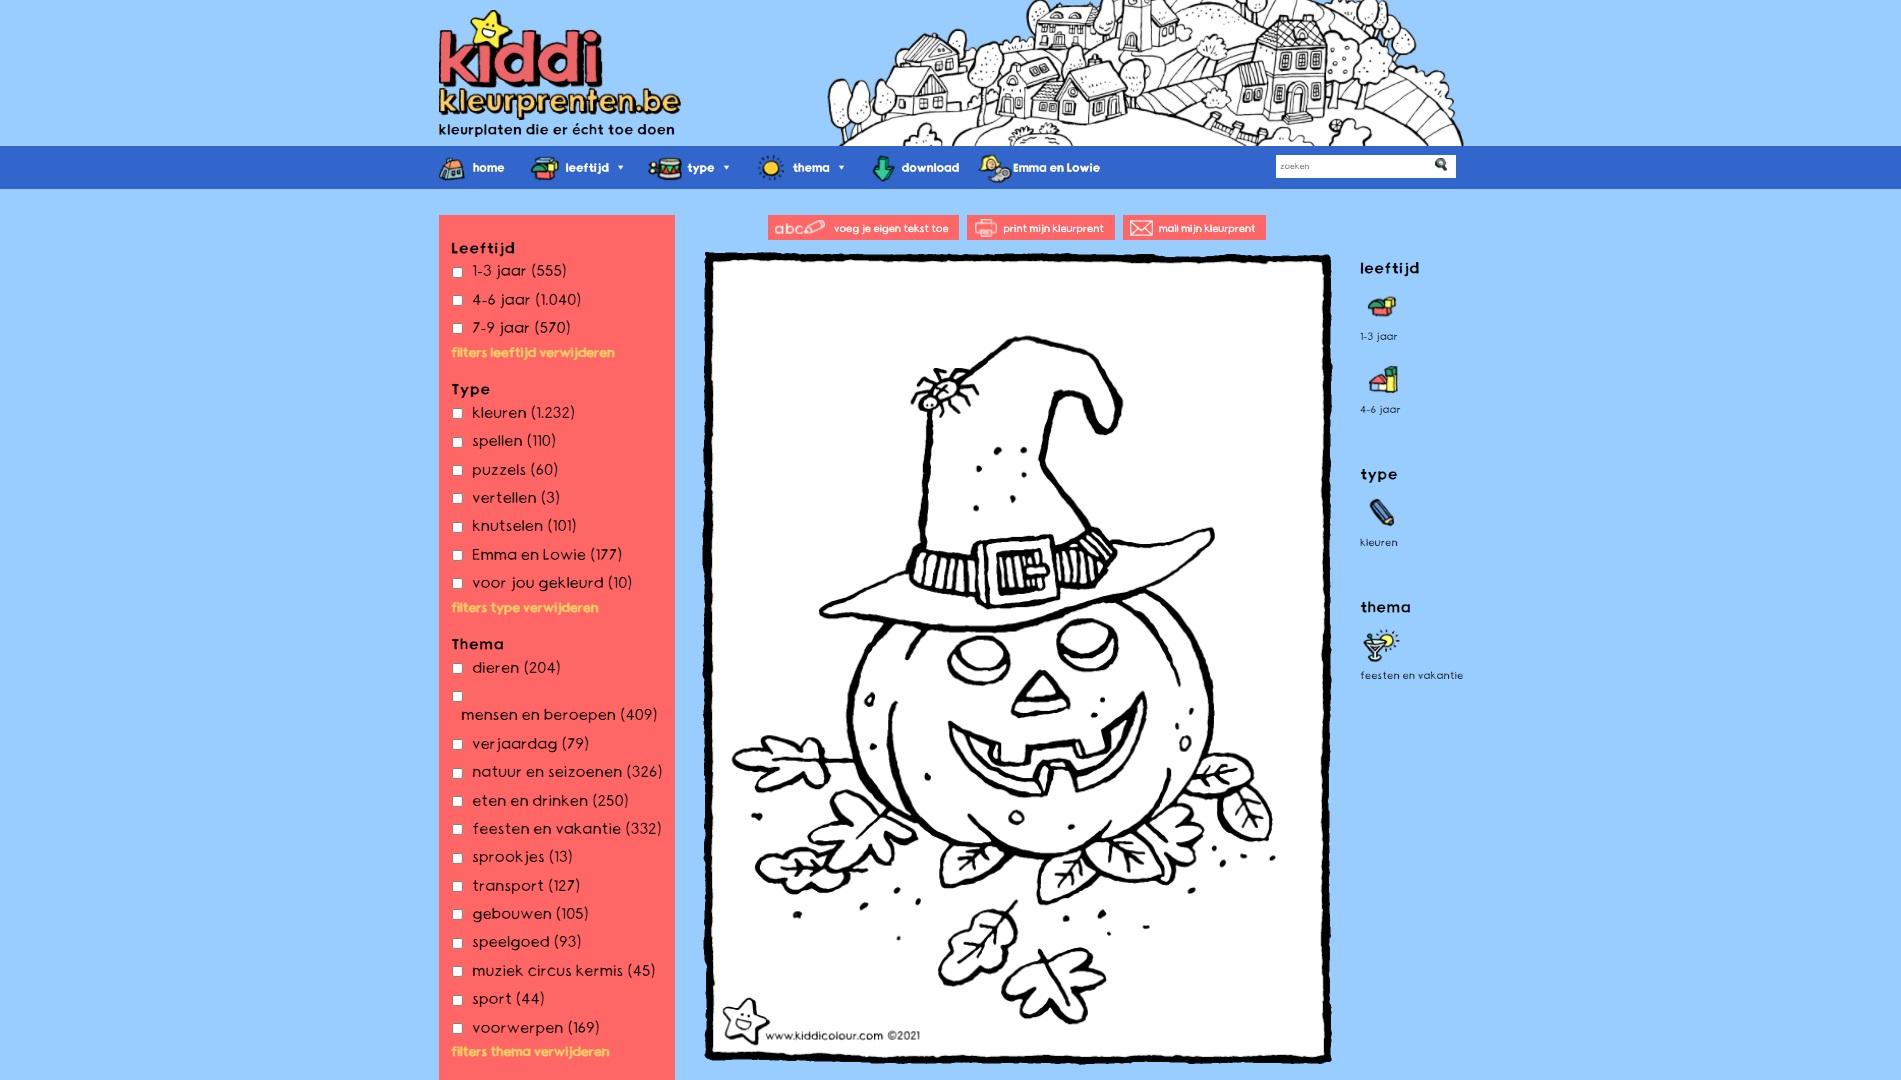 Mooiste webshop België